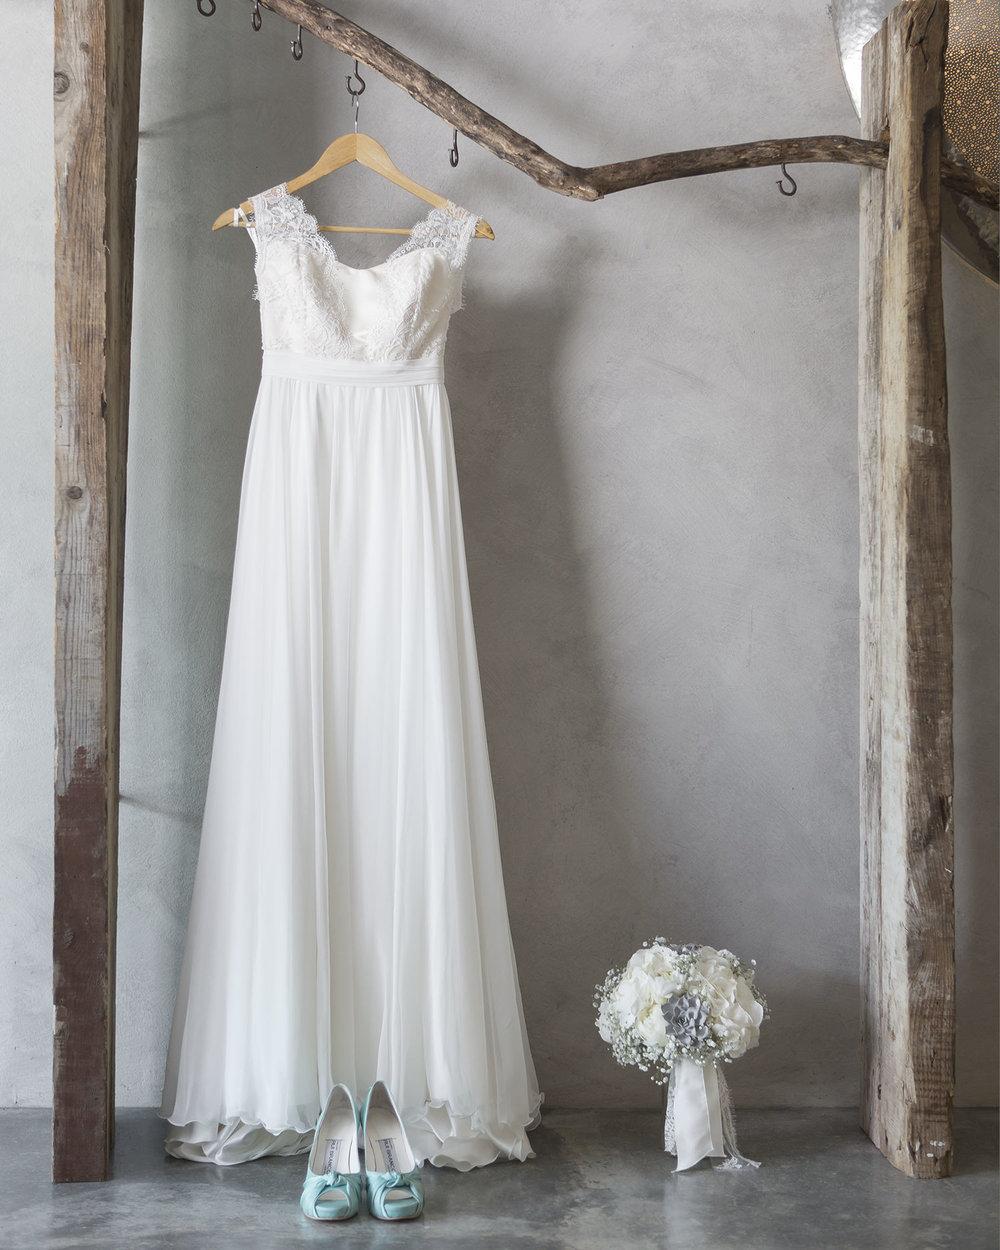 areias-seixo-wedding-photographer-terra-fotografia-004.jpg